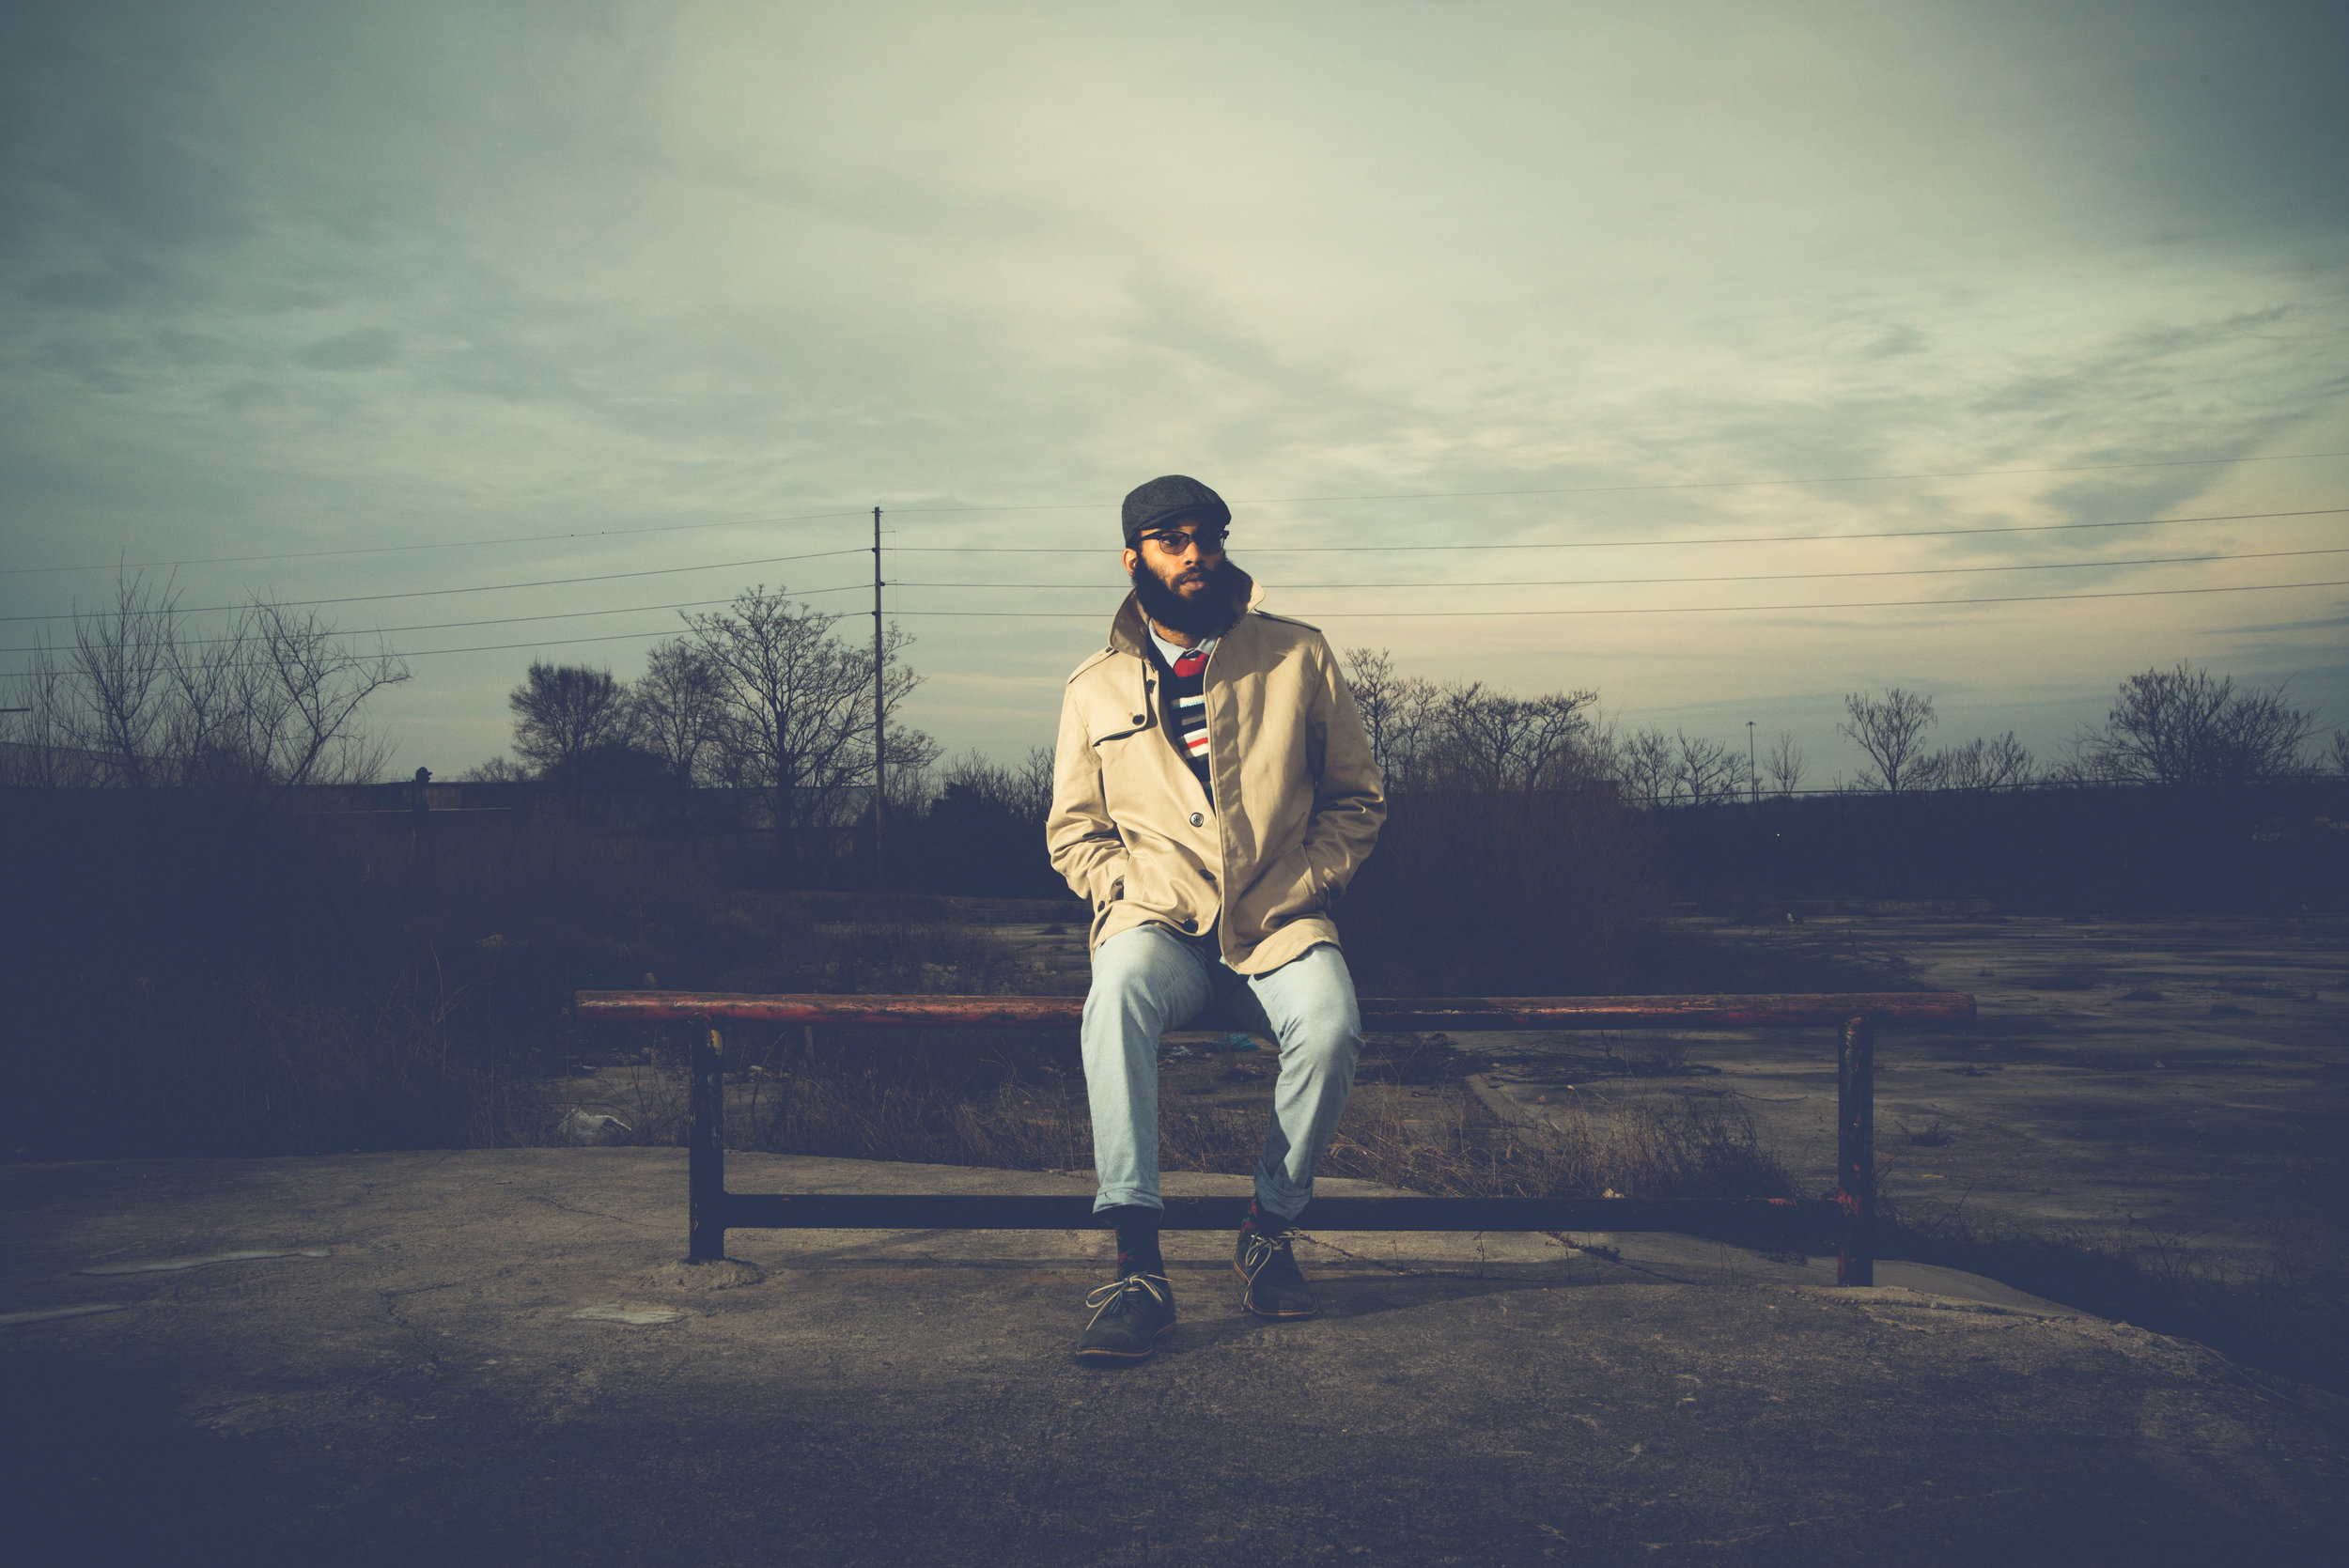 portraits-12.jpg